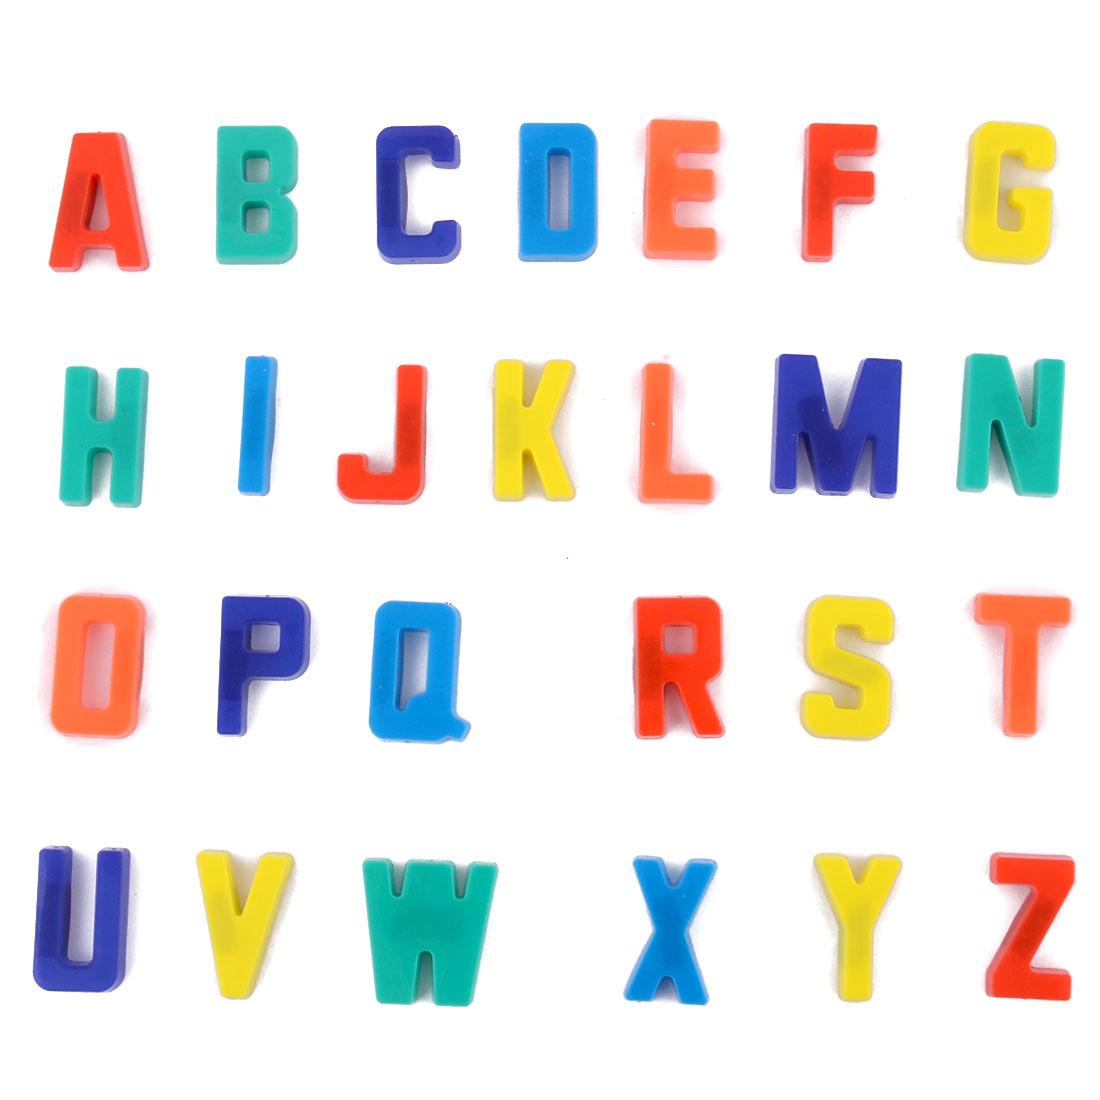 Plastic English Letters Whiteboard Fridge Magnet Multi-color 26 in 1